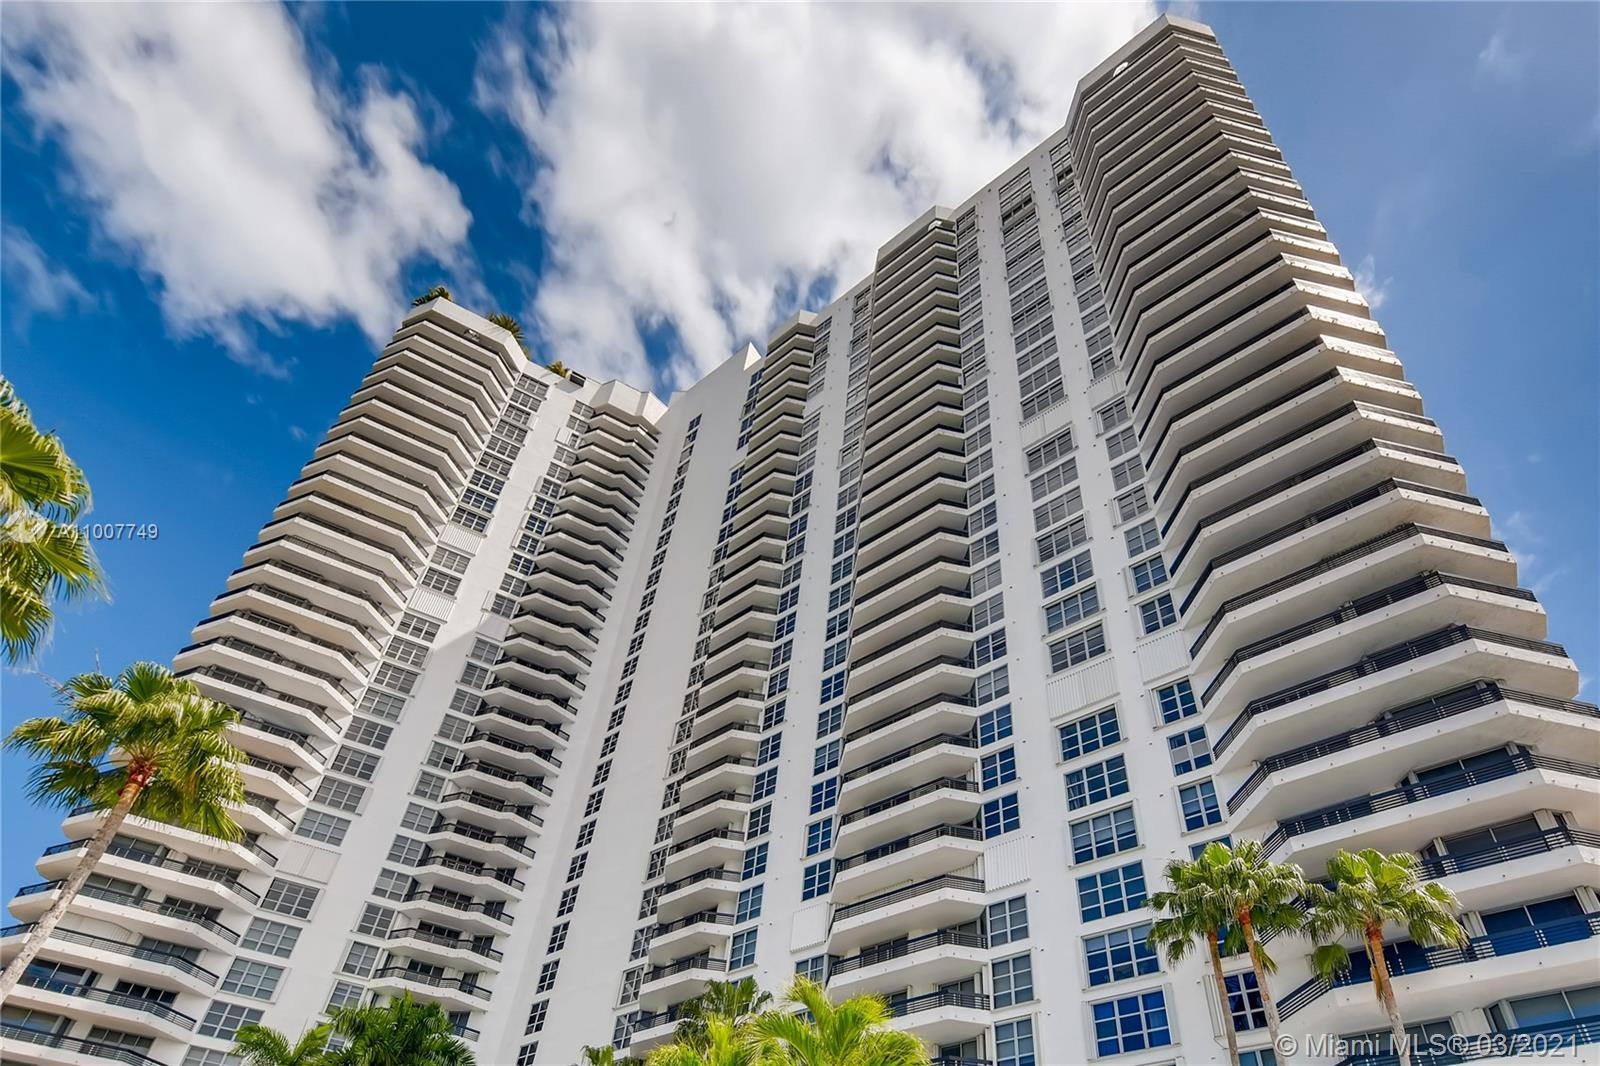 Mystic Pointe Tower 500 #603 - 3530 Mystic Pointe Dr #603, Aventura, FL 33180